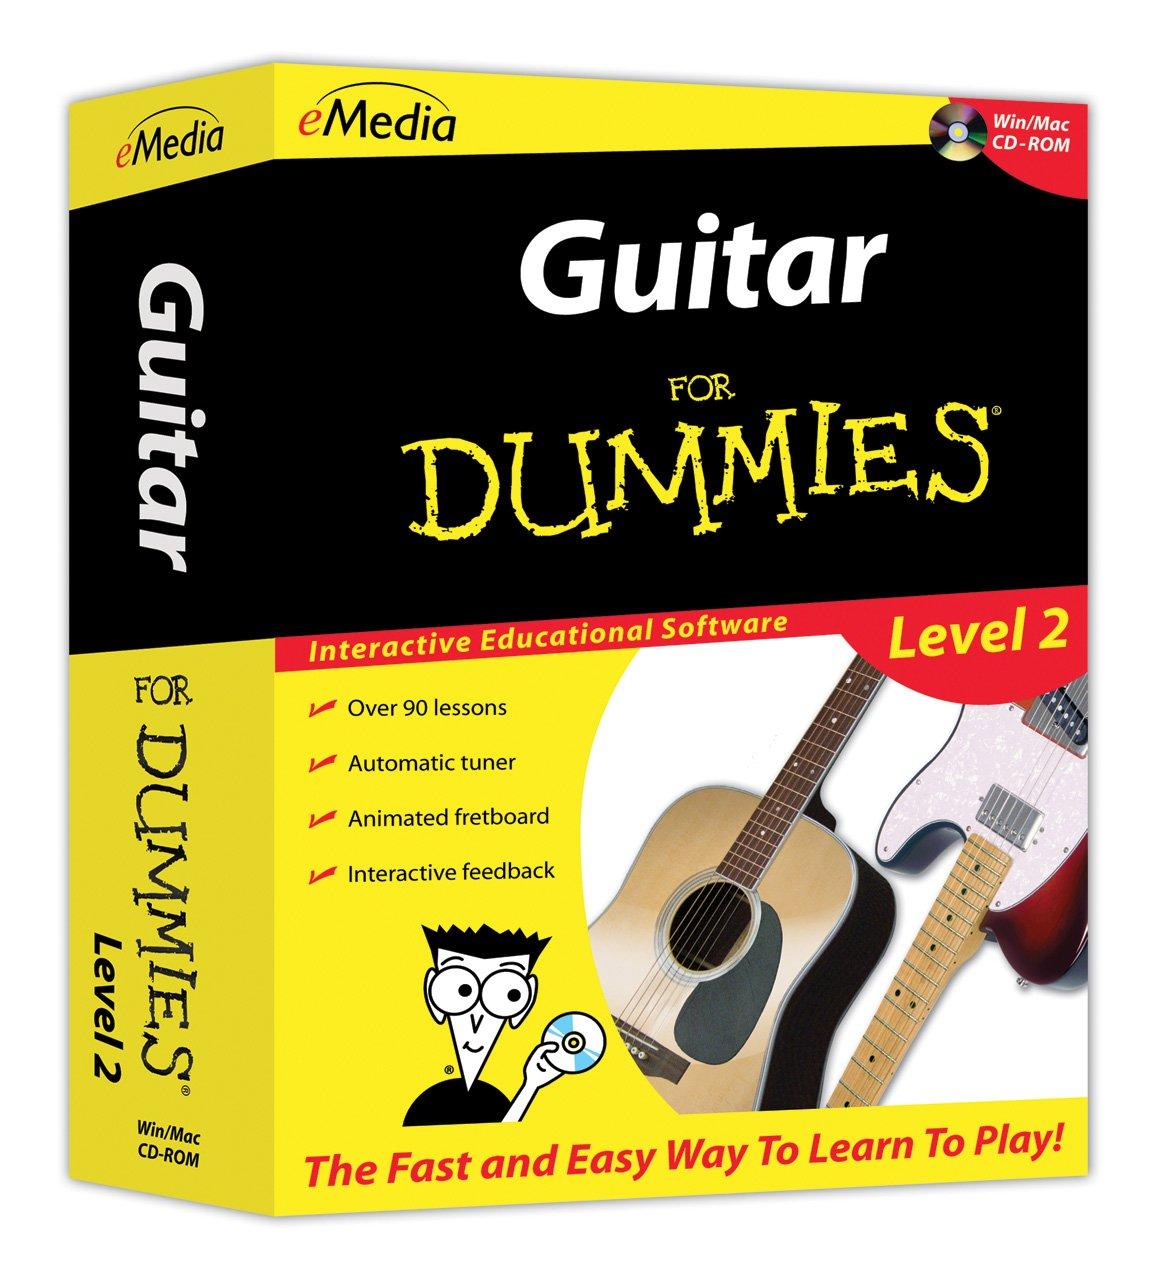 eMedia Guitar For Dummies Level 2 by eMedia